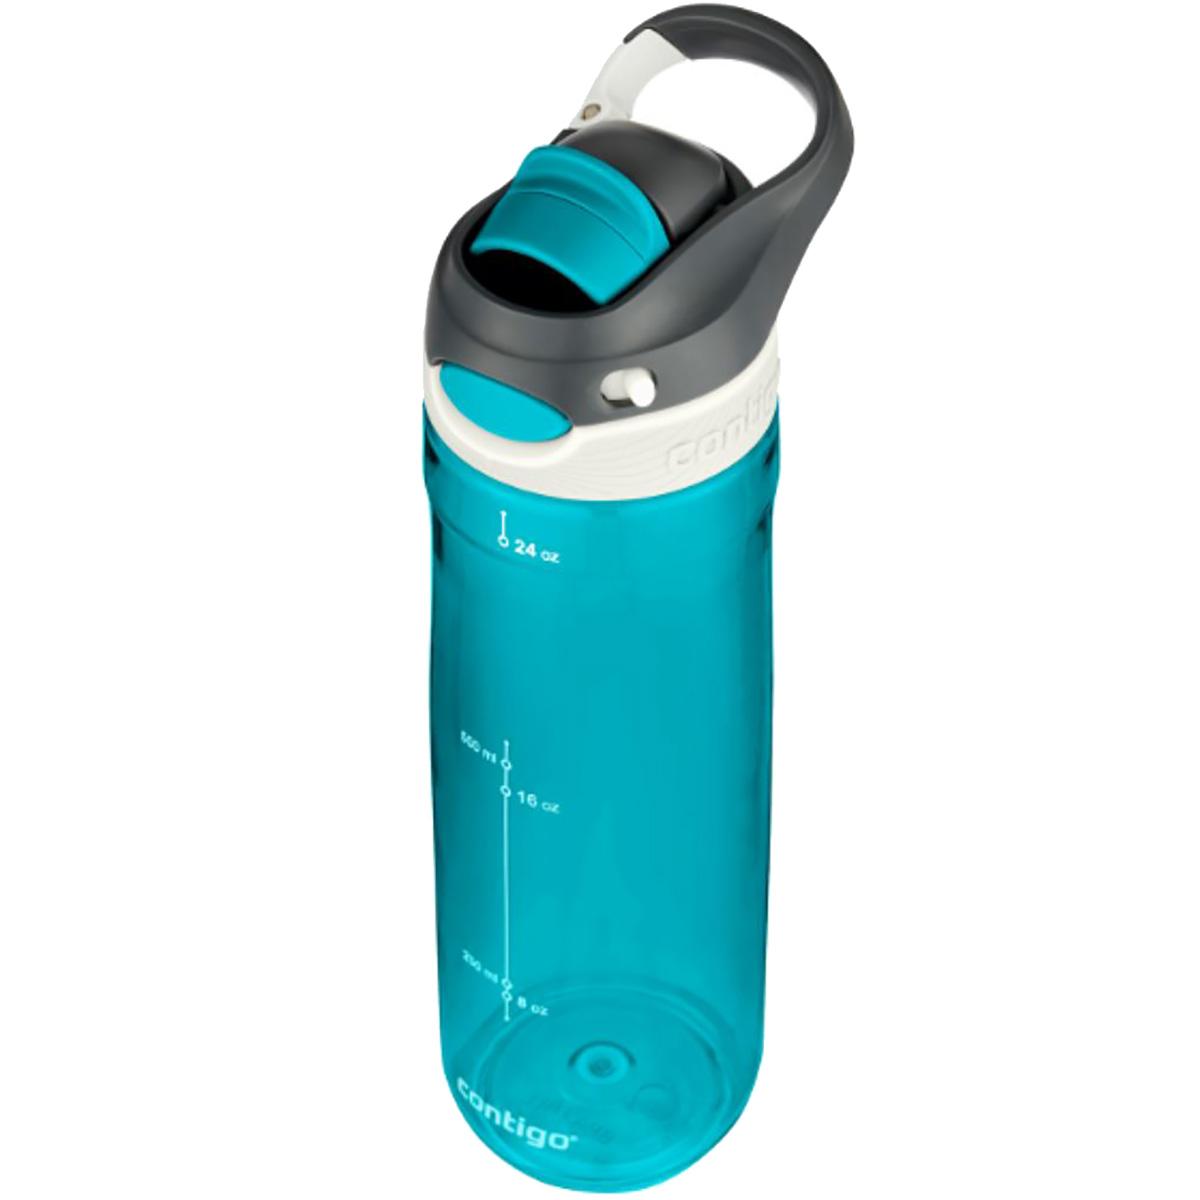 Contigo-24-oz-Chug-Autospout-Leak-Proof-Water-Bottle miniatuur 18